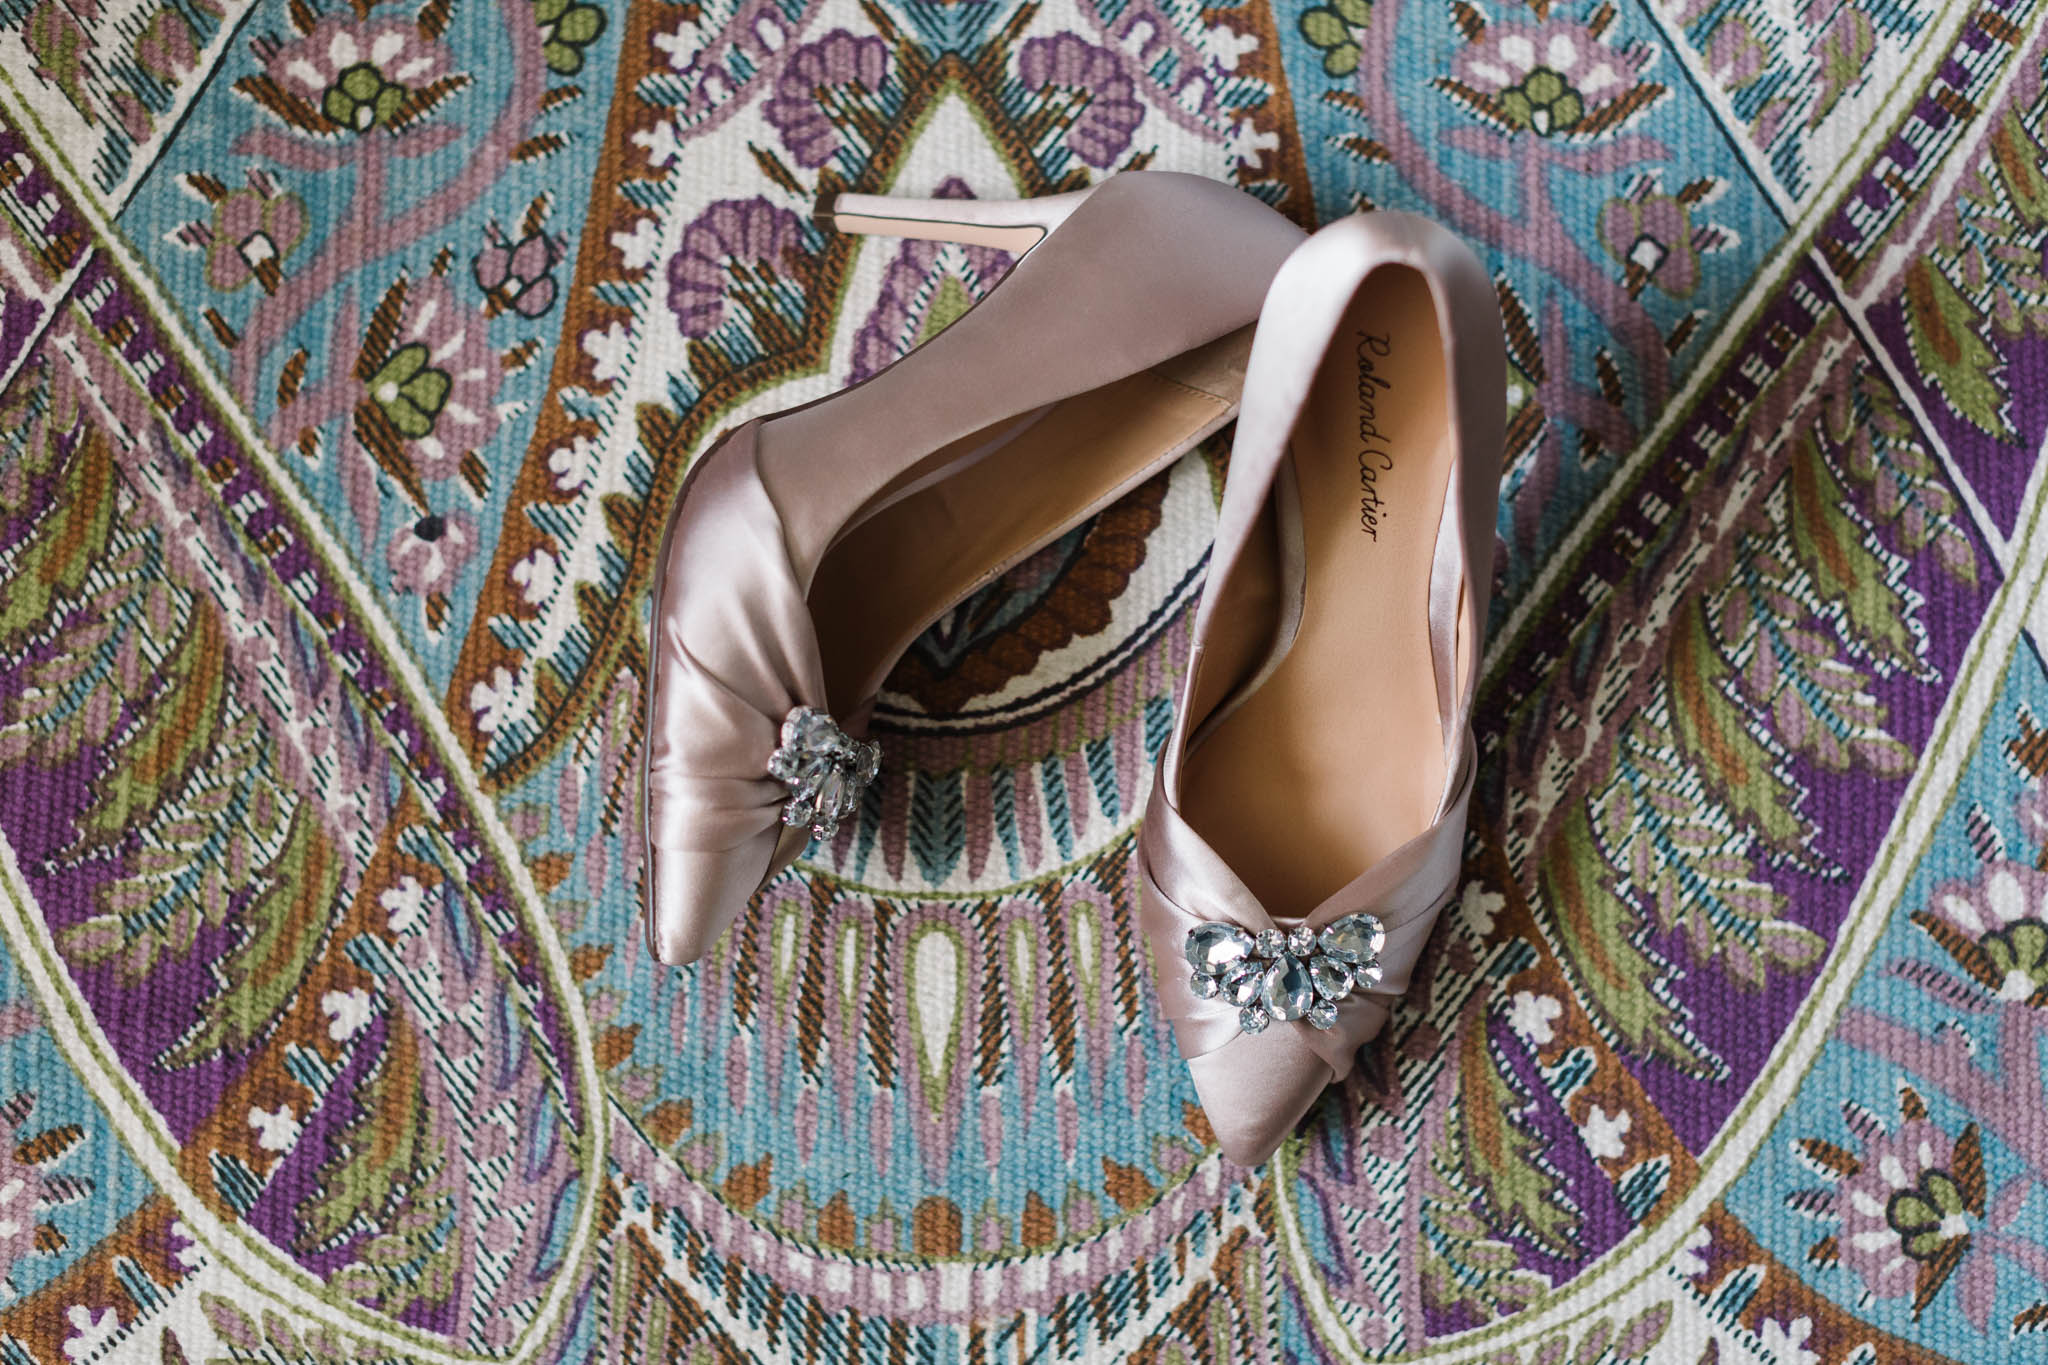 blush pink roland cartier wedding shoes